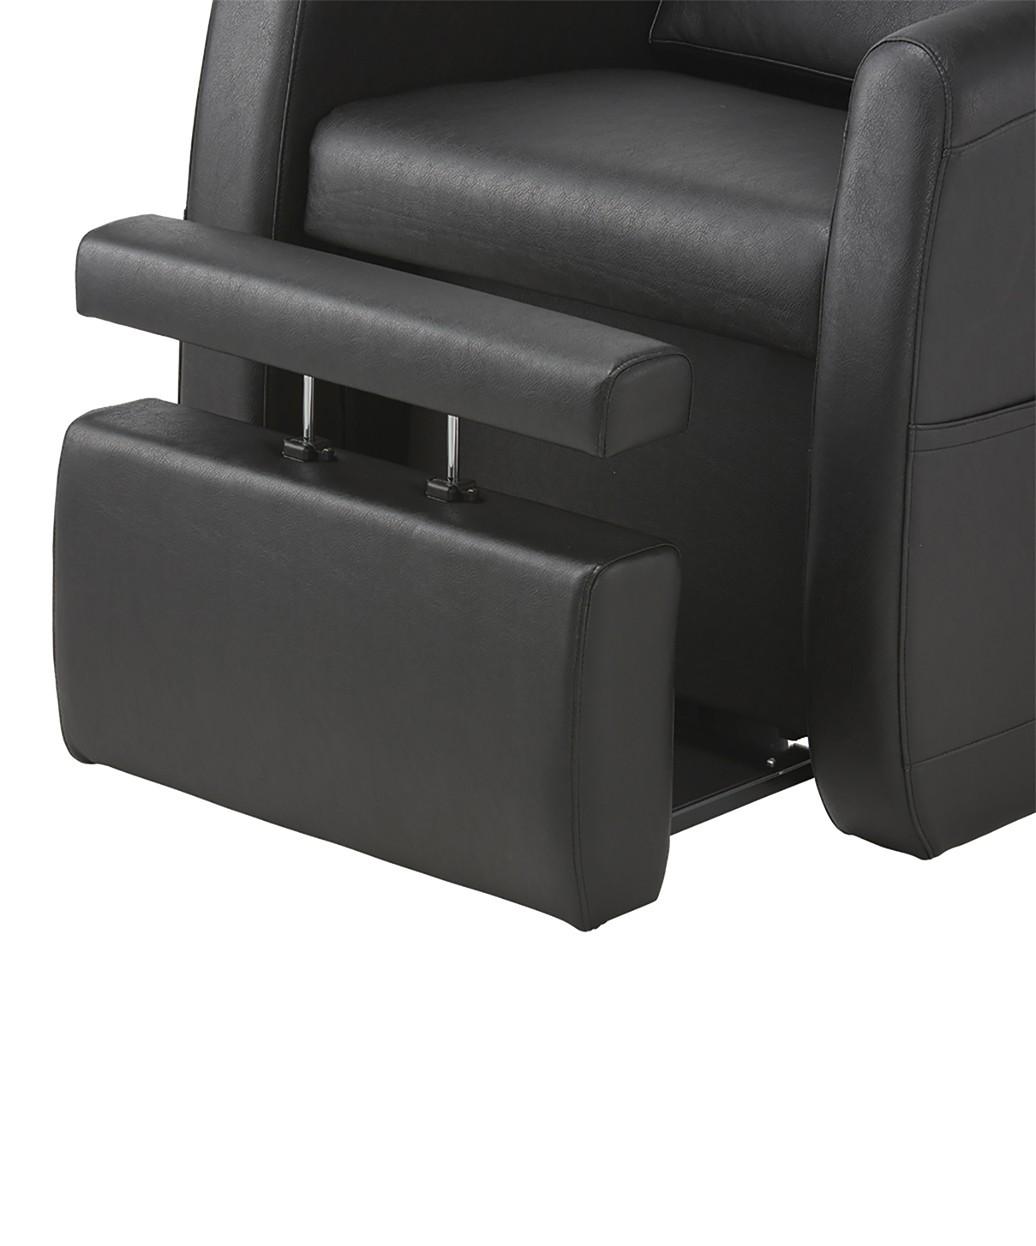 Pibbs PS9 Lounge Pedicure Chair w/ Vibration Massage